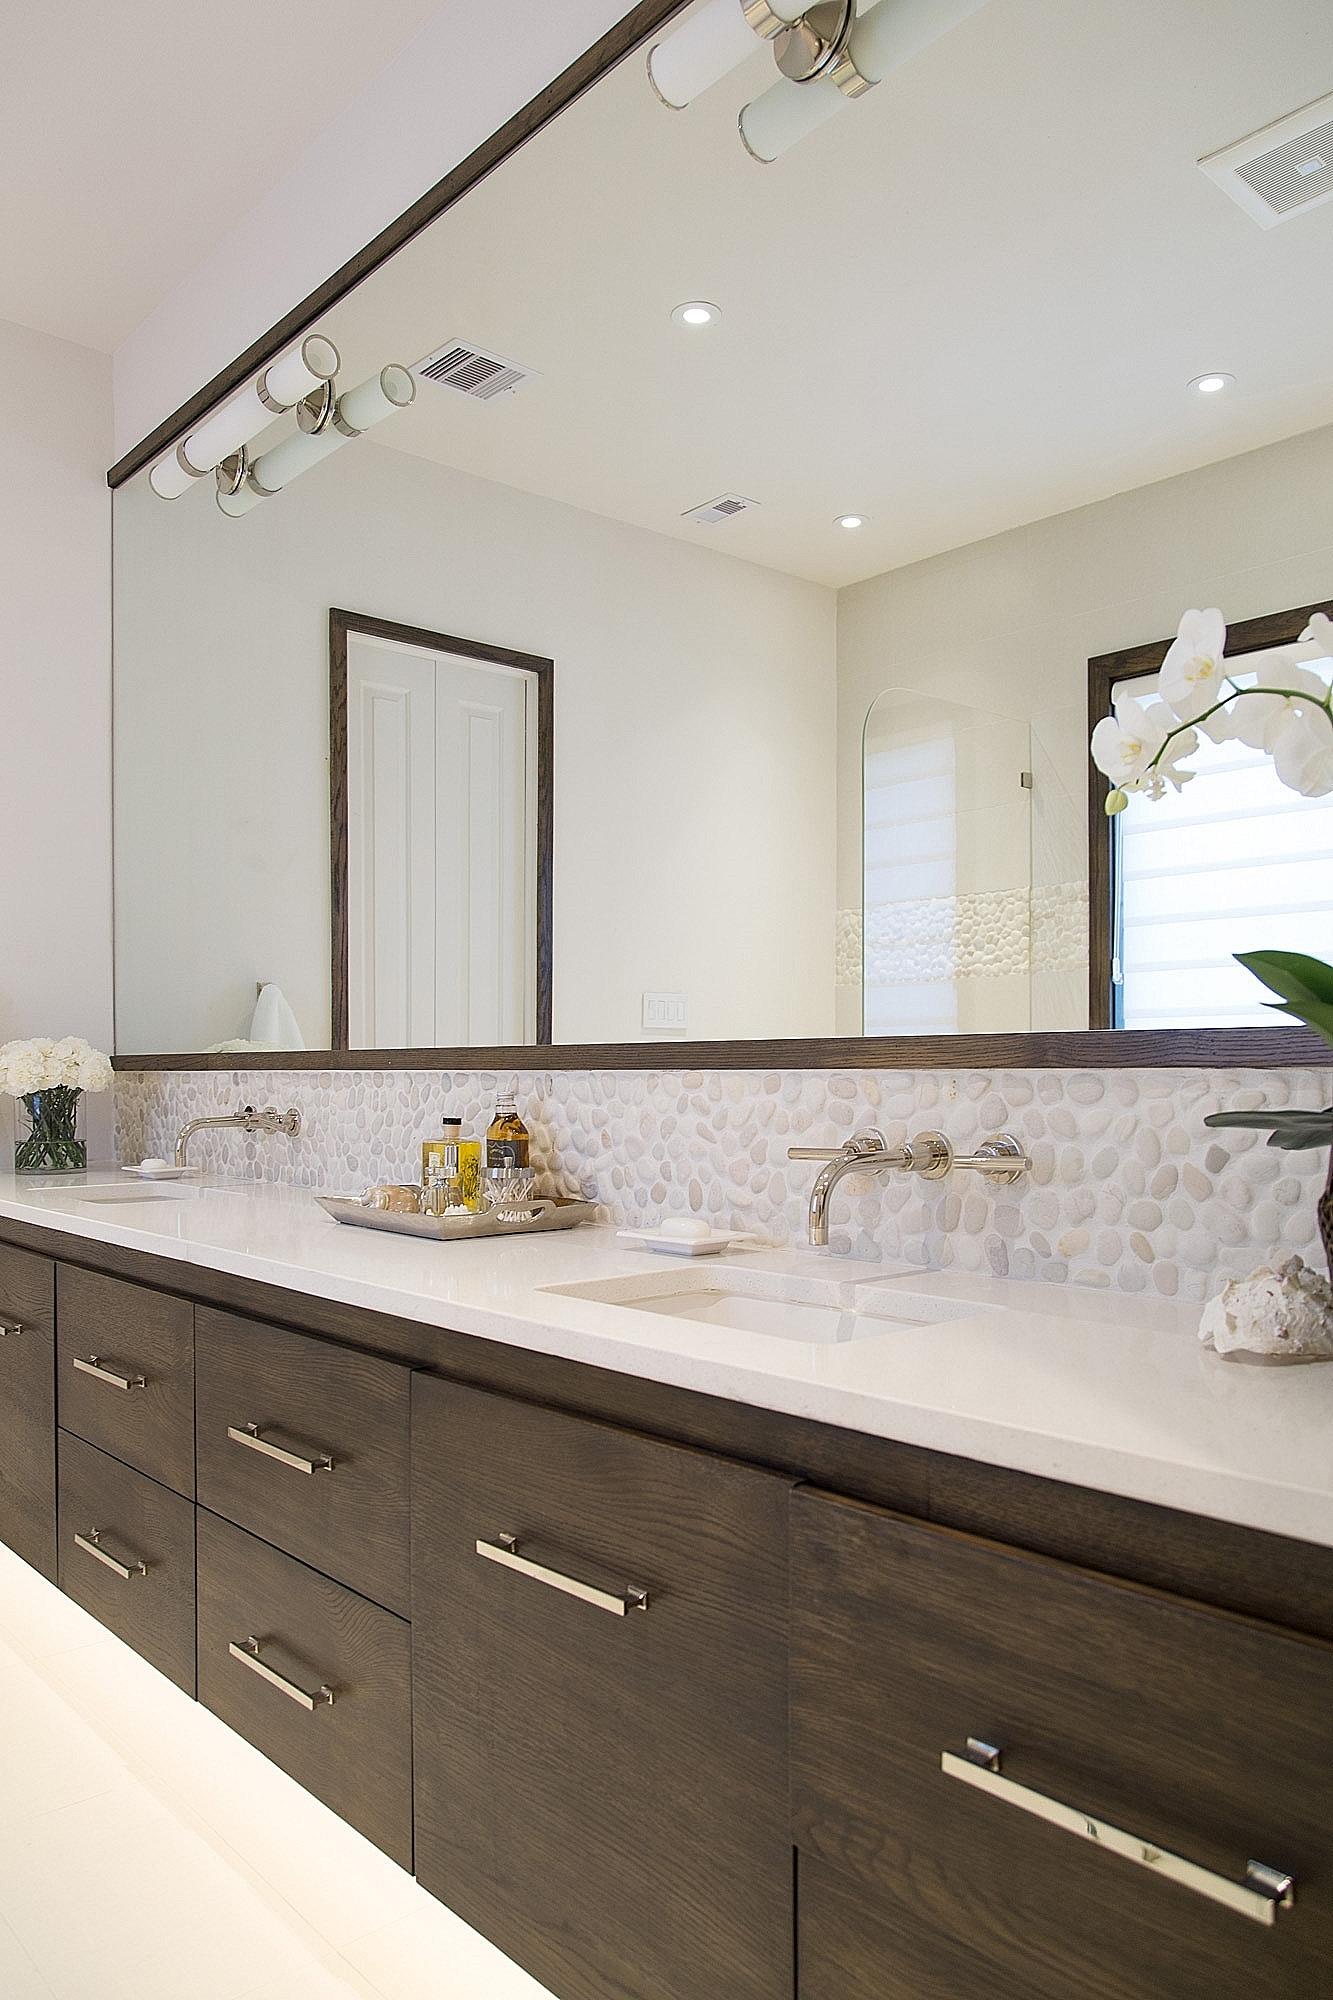 Wall to wall mirror to make bathroom seem bigger - Designer Carla Aston, Photo by Tori Aston